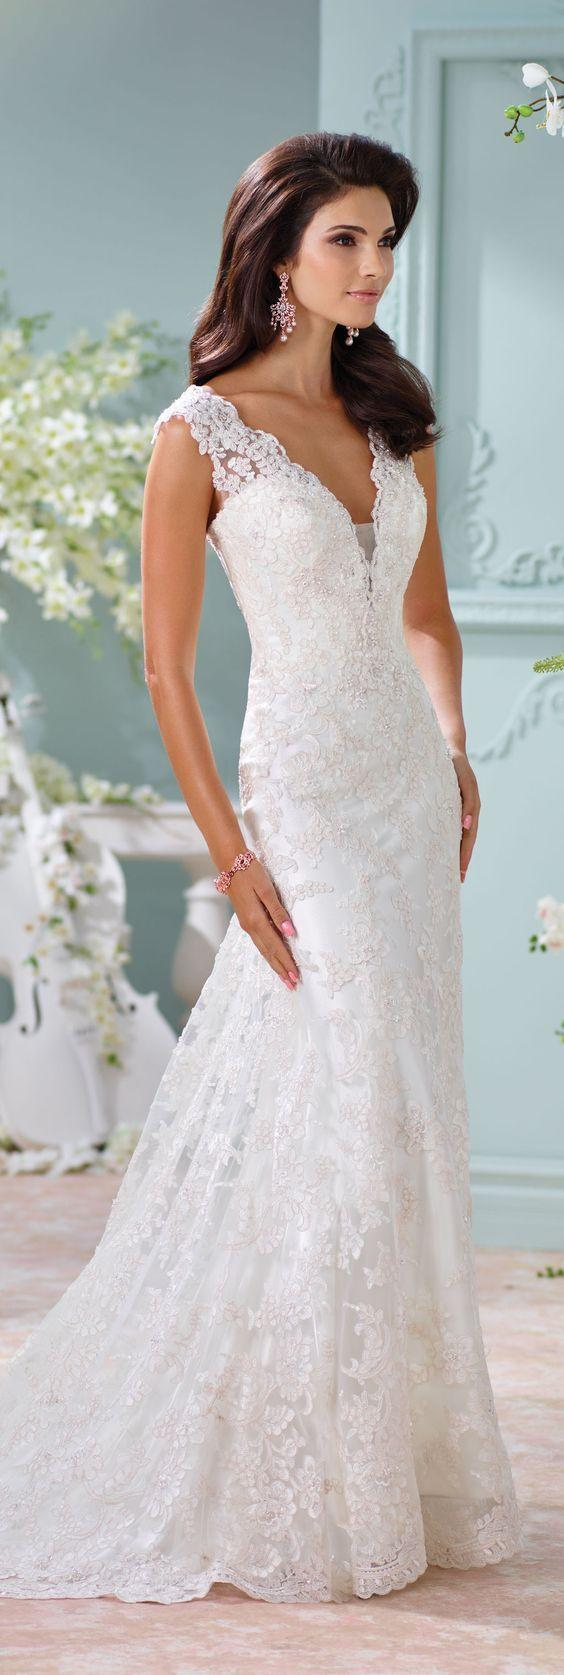 زفاف - Beautiful Wedding Dress